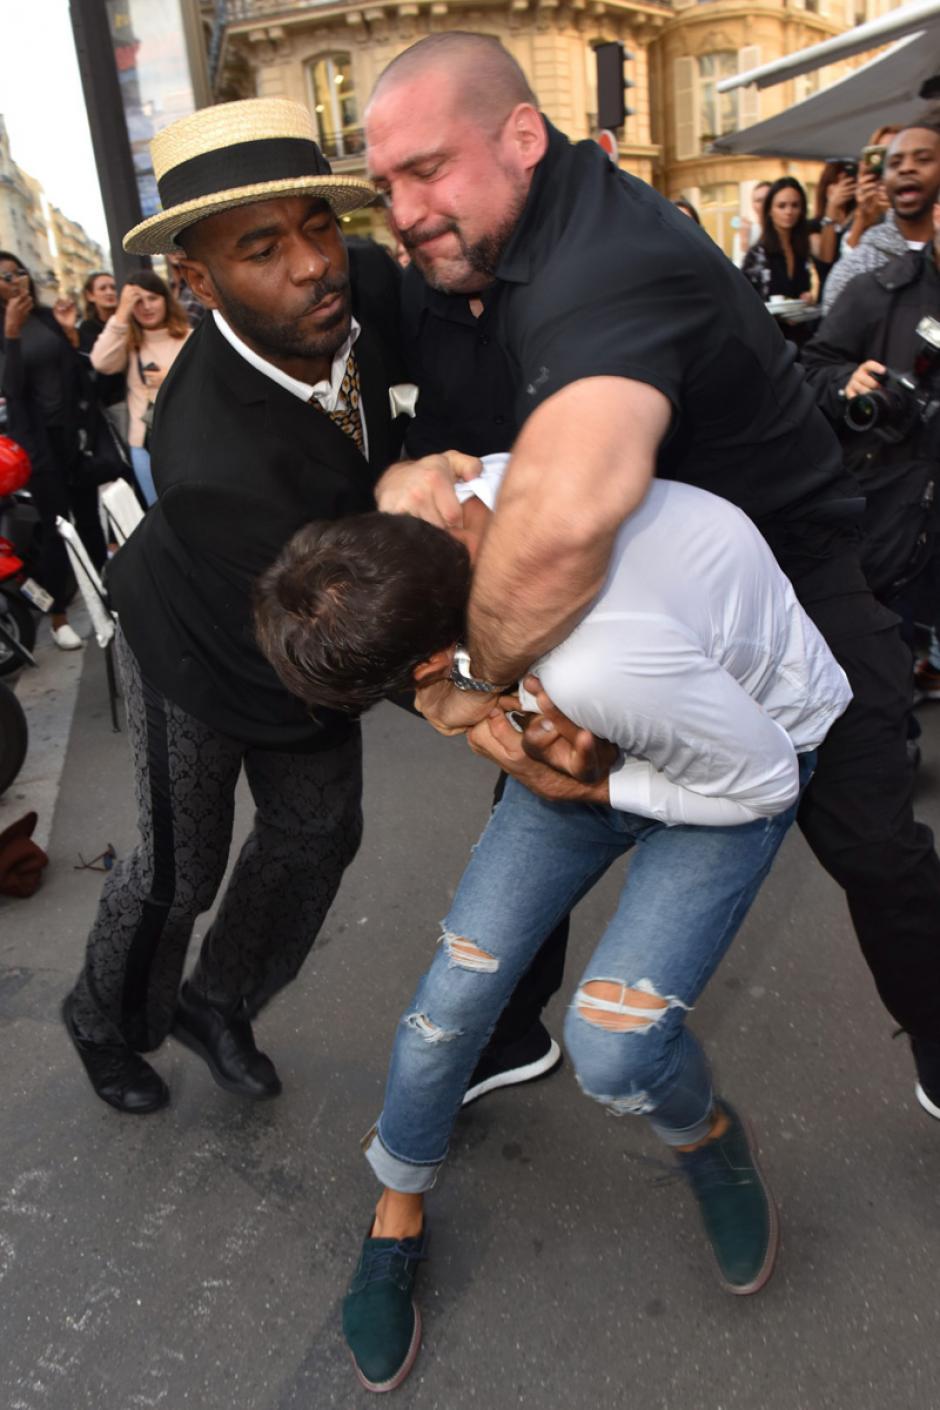 El guardaespaldas de Kardashian sometió al atacante. (Foto: smoda.elpais.com)